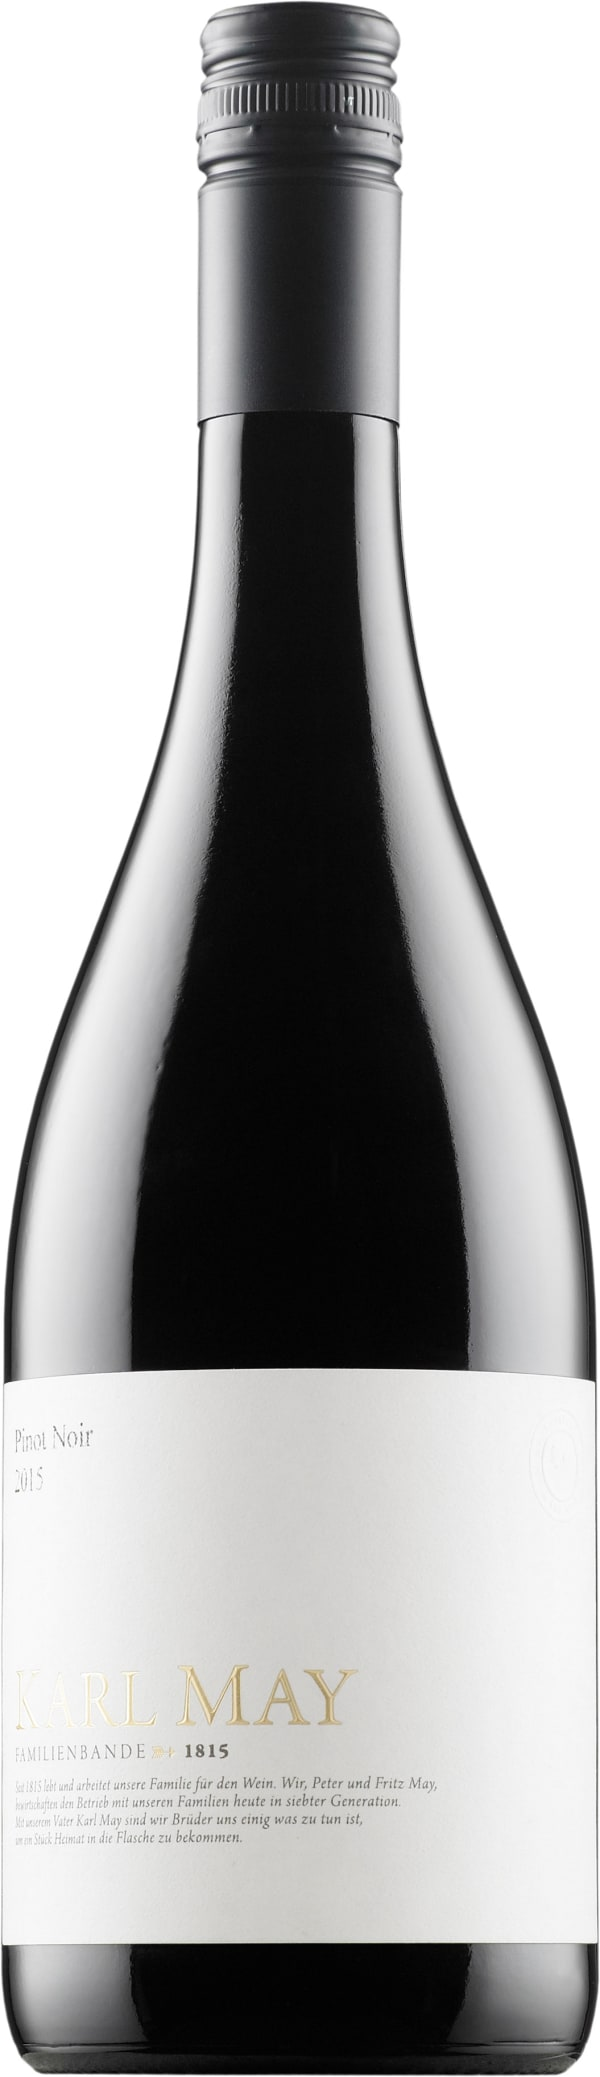 Karl May Pinot Noir 2018